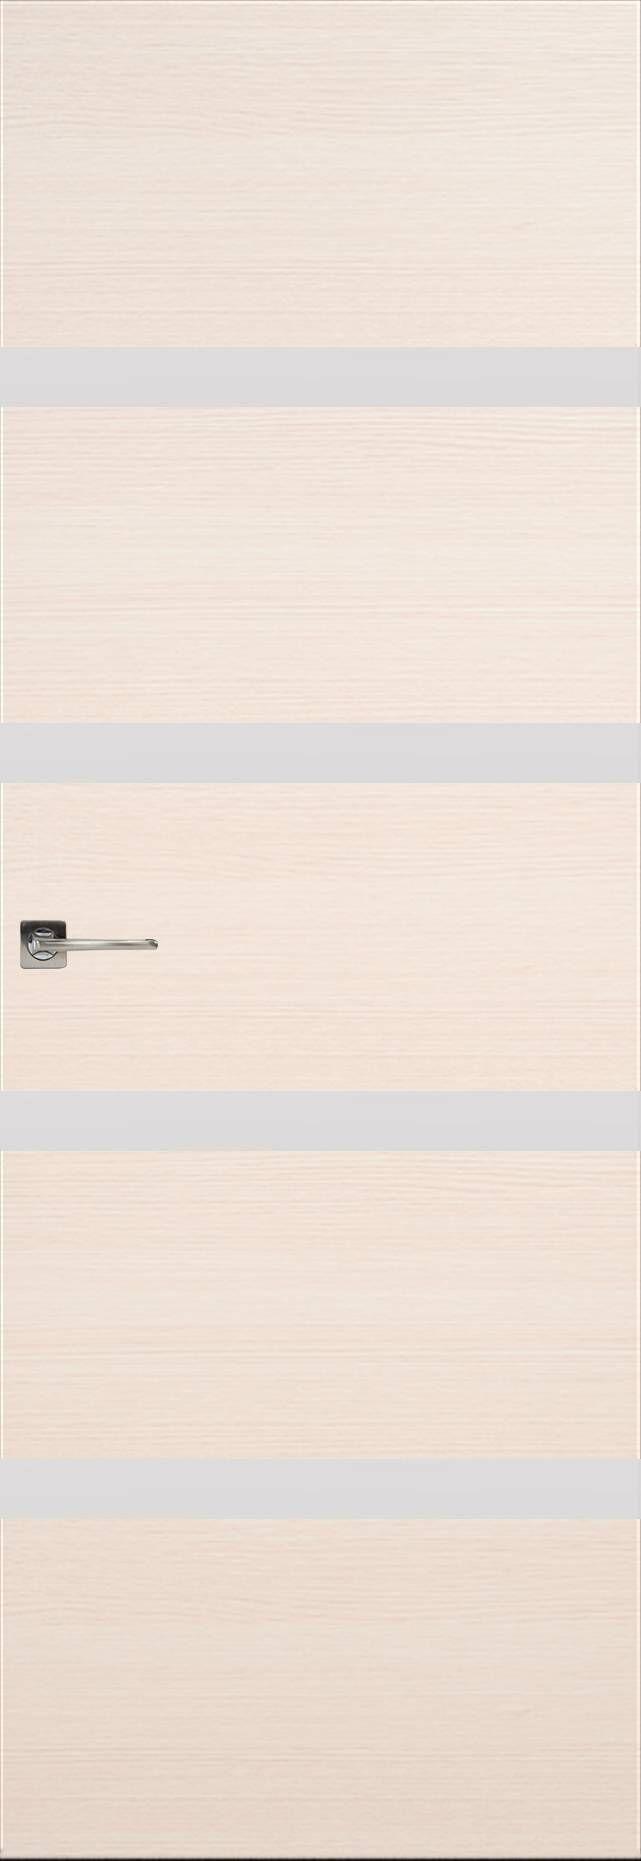 Tivoli Д-4 Invisible цвет - Беленый дуб Без стекла (ДГ)